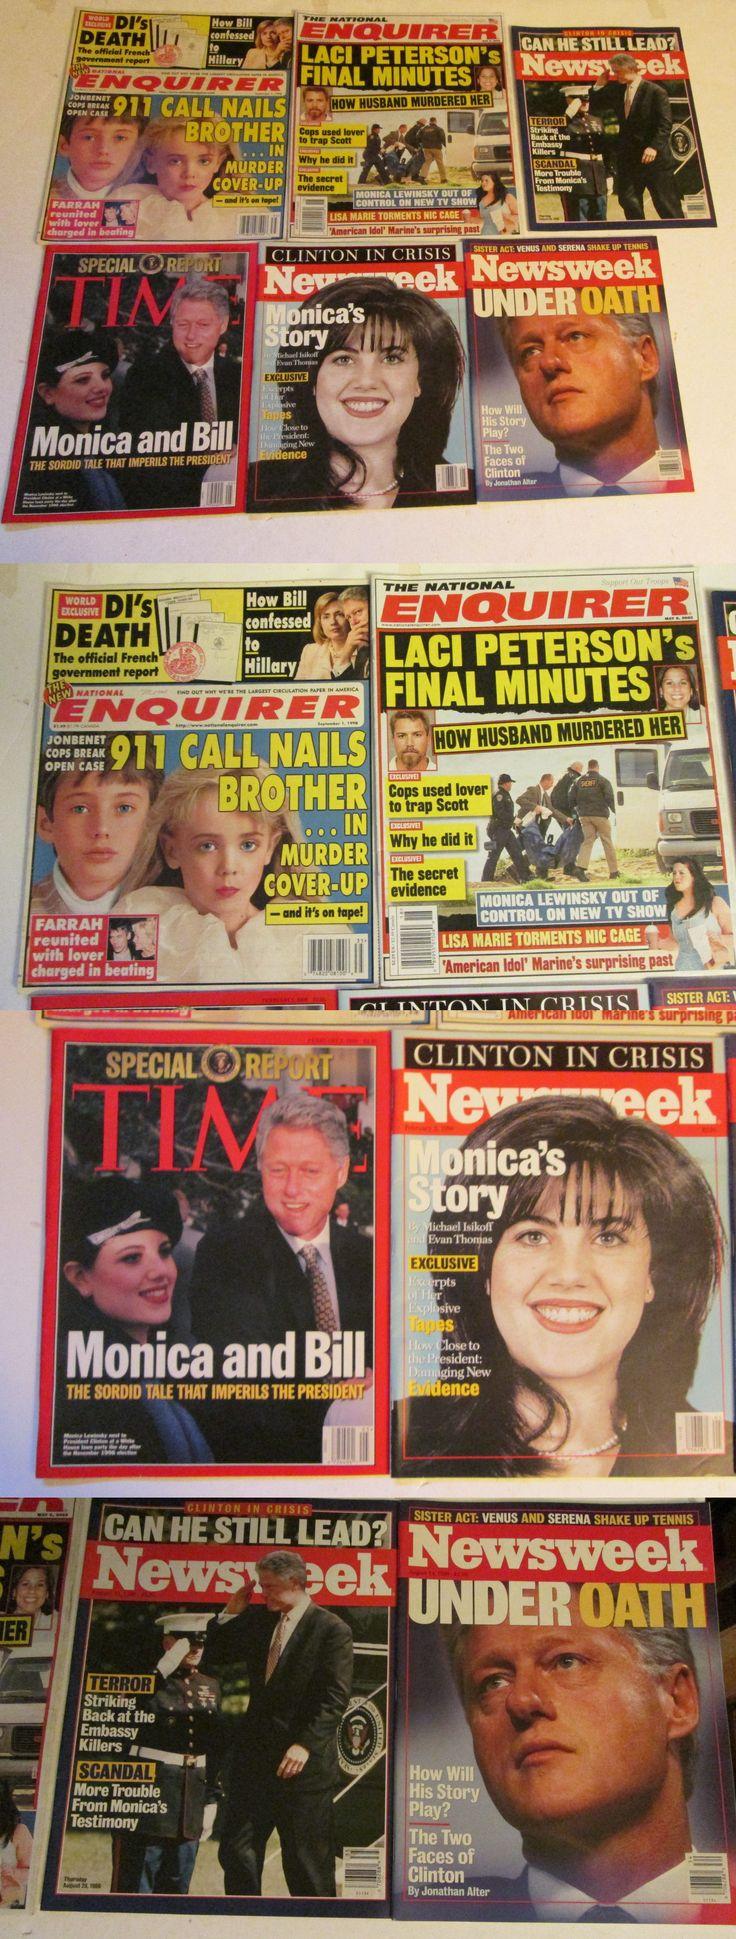 Bill Clinton: Lot Of 6 Bill Clinton Scandal Magazines Rare Oop Tabloids Monica Lewinsky 90S -> BUY IT NOW ONLY: $6.99 on eBay!